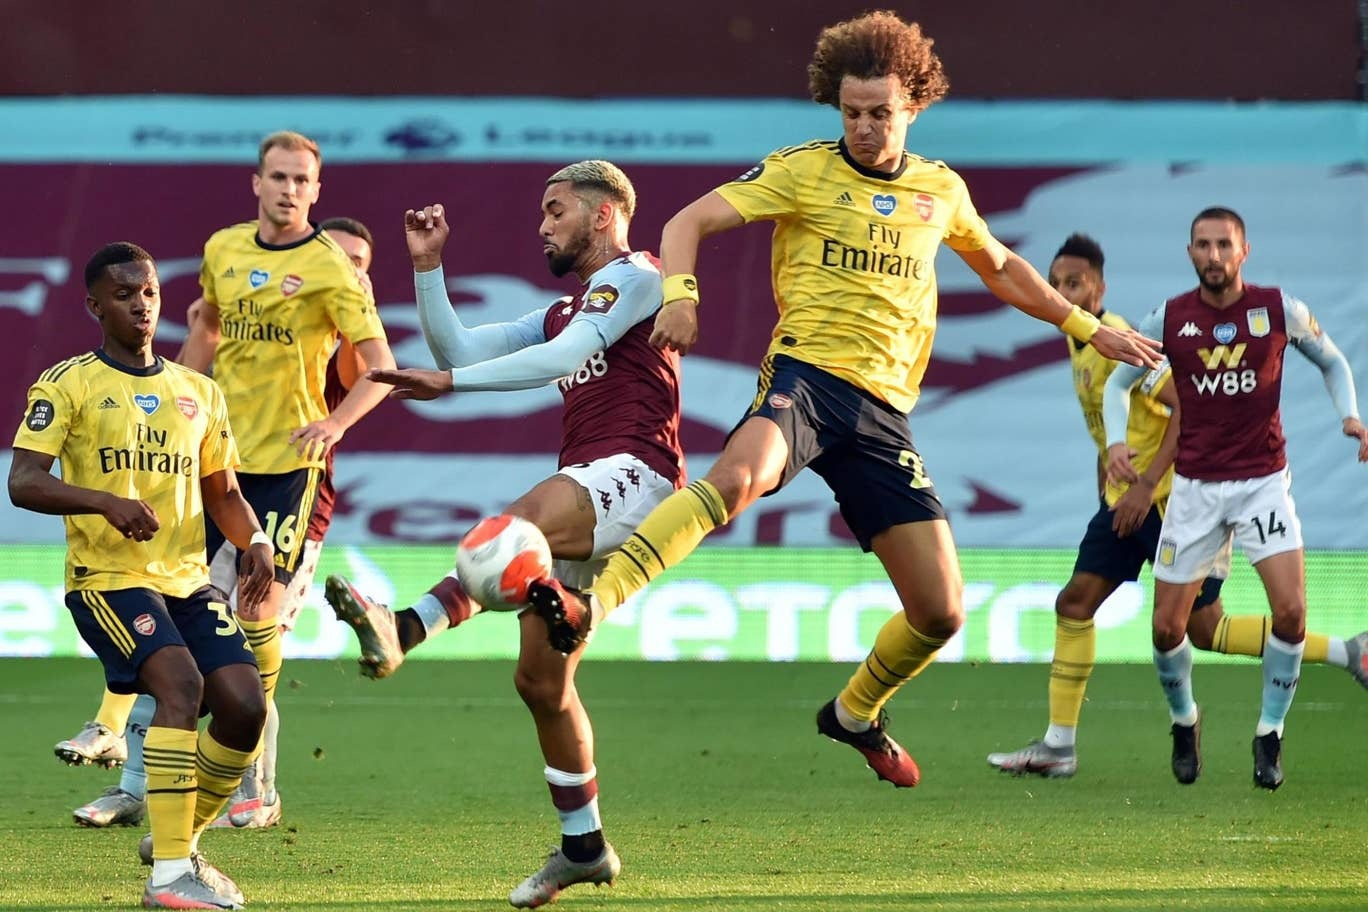 aston villa 1 0 arsenal trezeguet winner rescues villa out of relegation zone